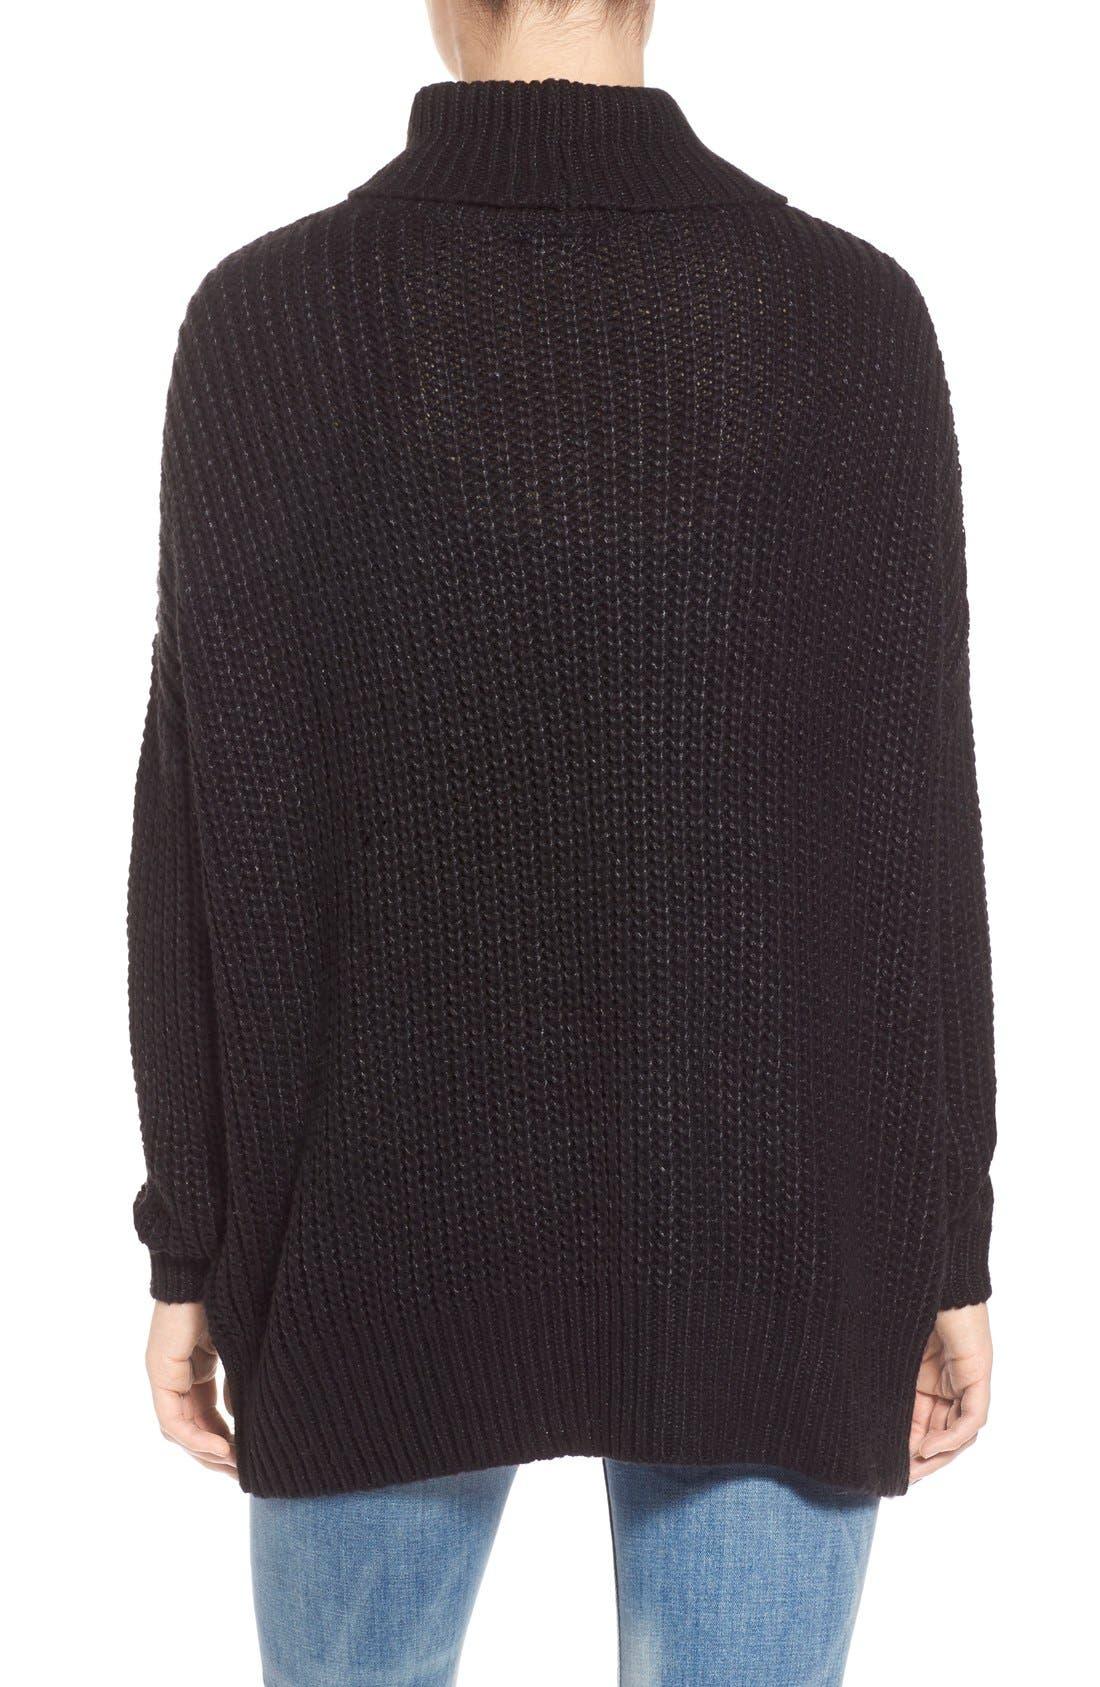 Oversize Turtleneck Sweater,                             Alternate thumbnail 5, color,                             001